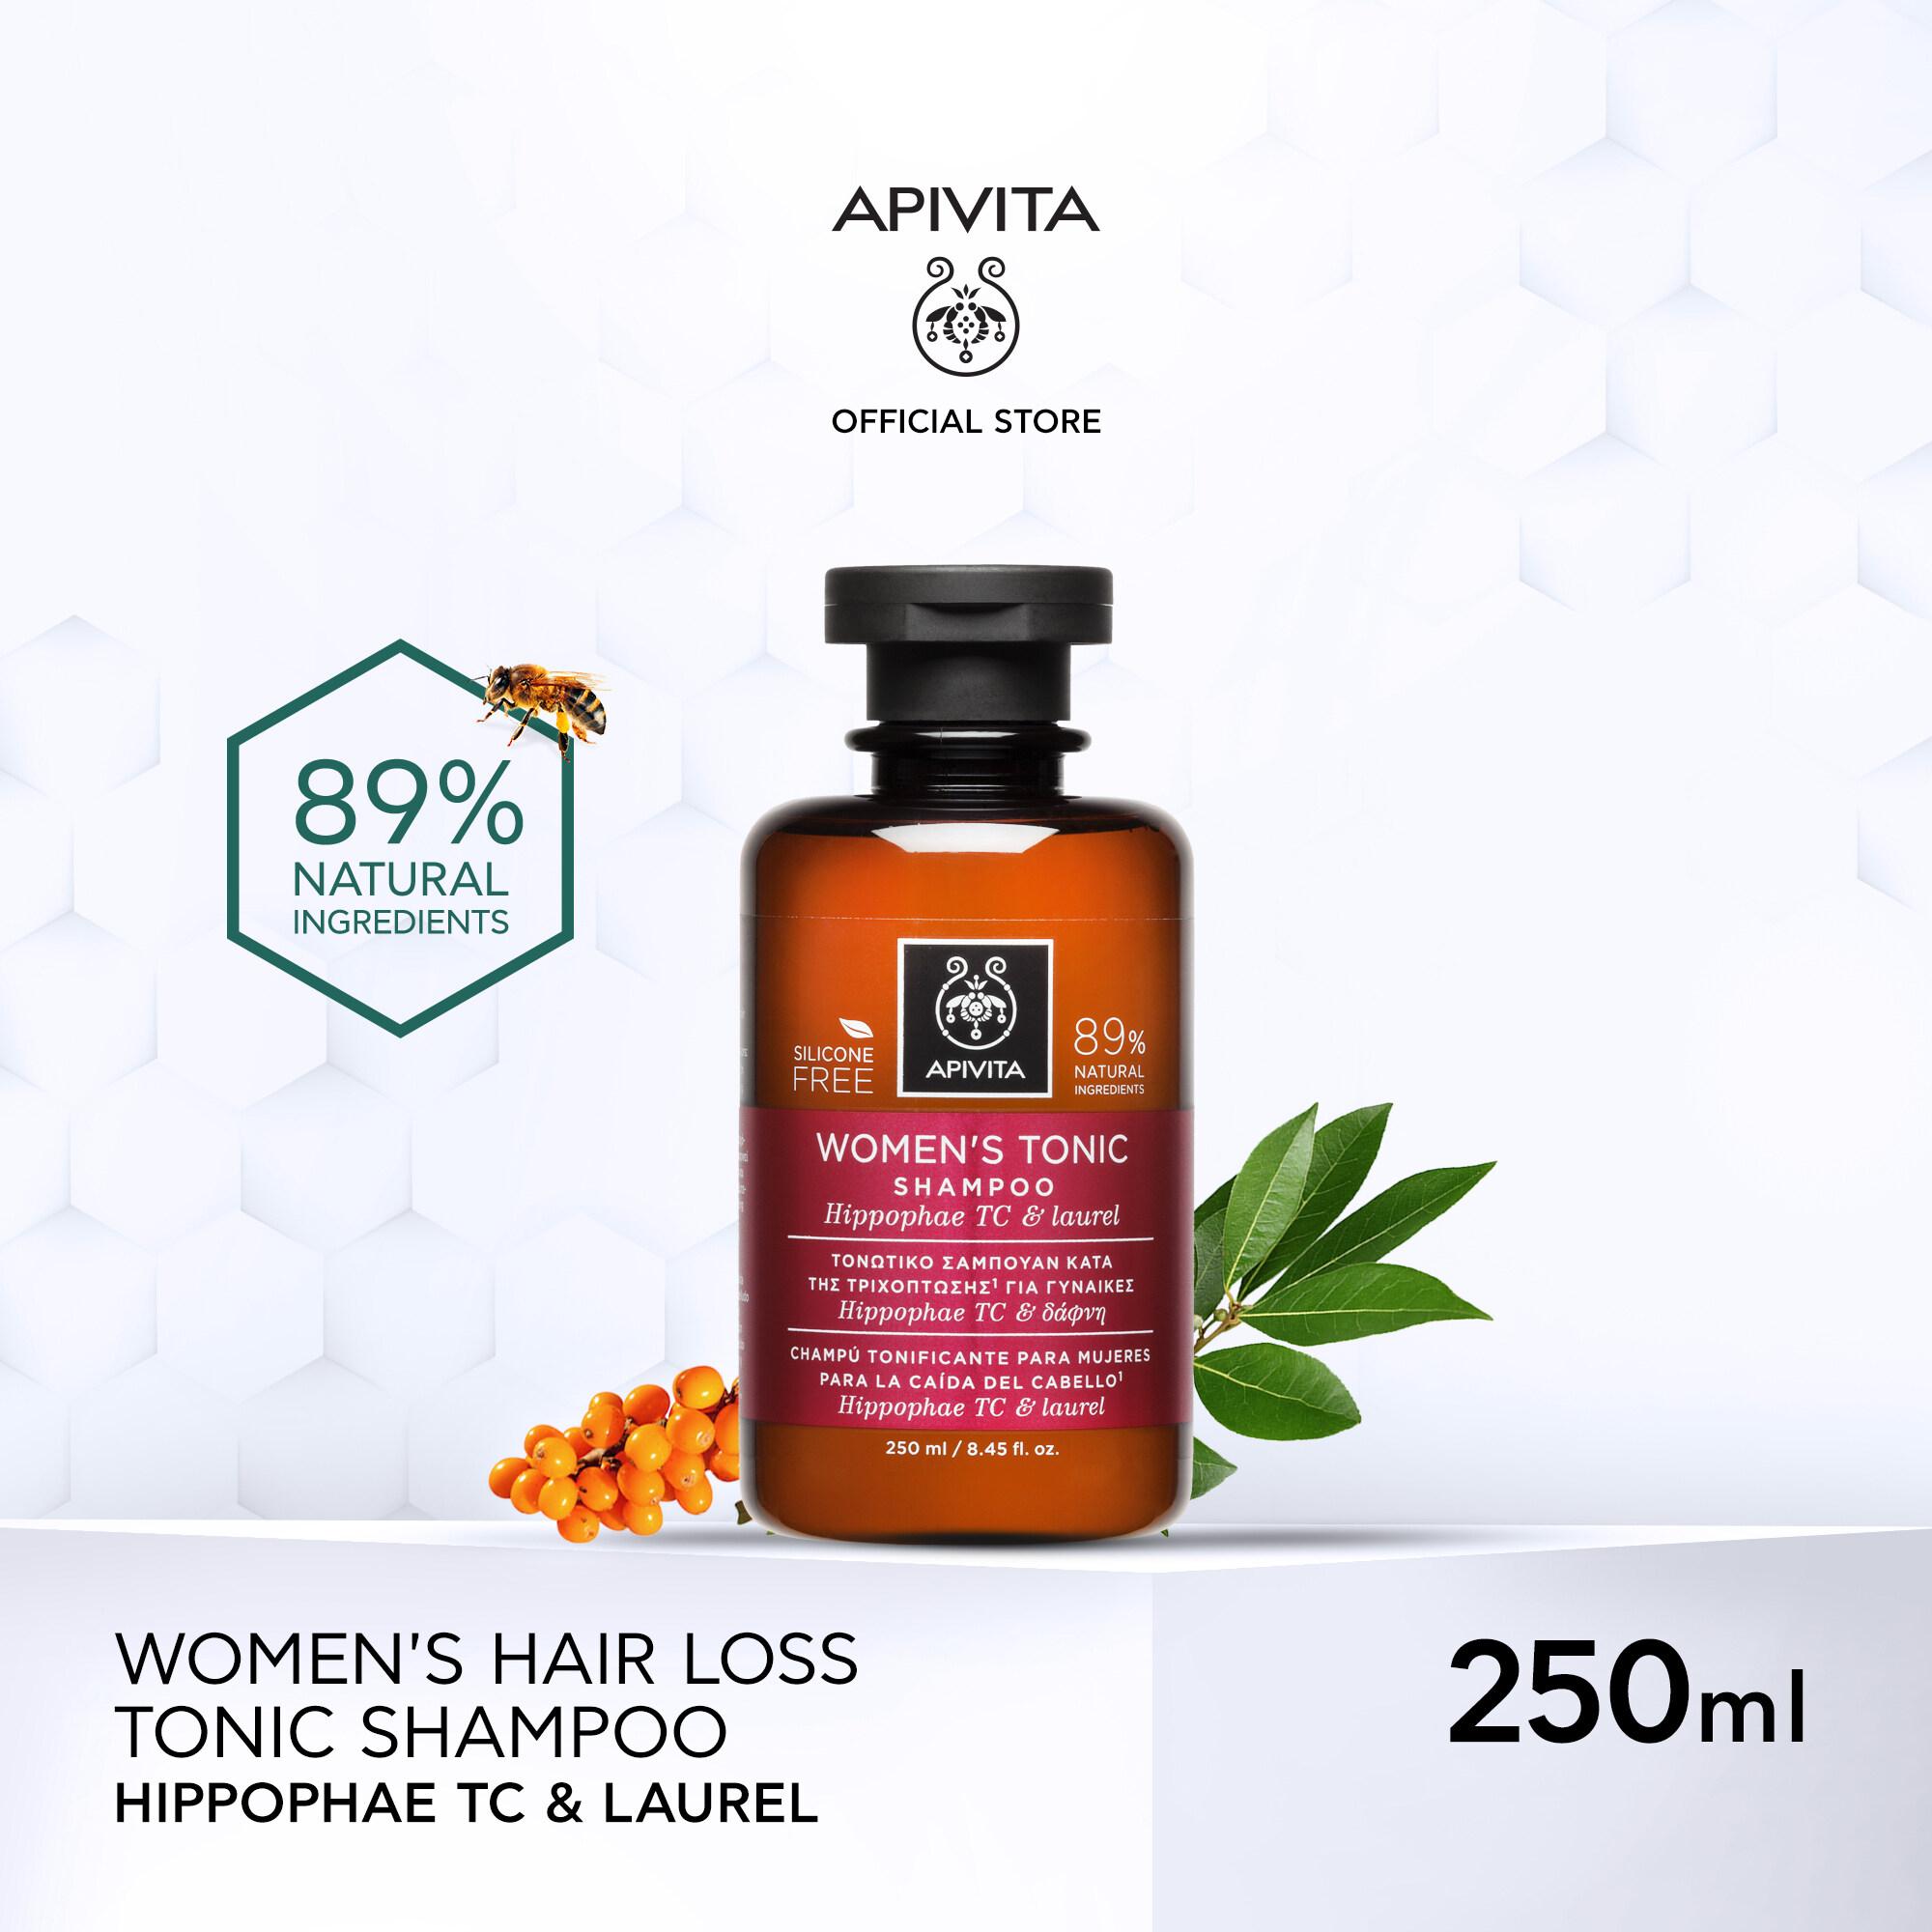 Apivita Womens Tonic Shampoo Hippophae Tc & Laural 250ml อะพิวิต้า วีเมน โทนิค แชมพู ฮิปโพรเพ ทีซี แอนด์ ลอเรล 250 มล..